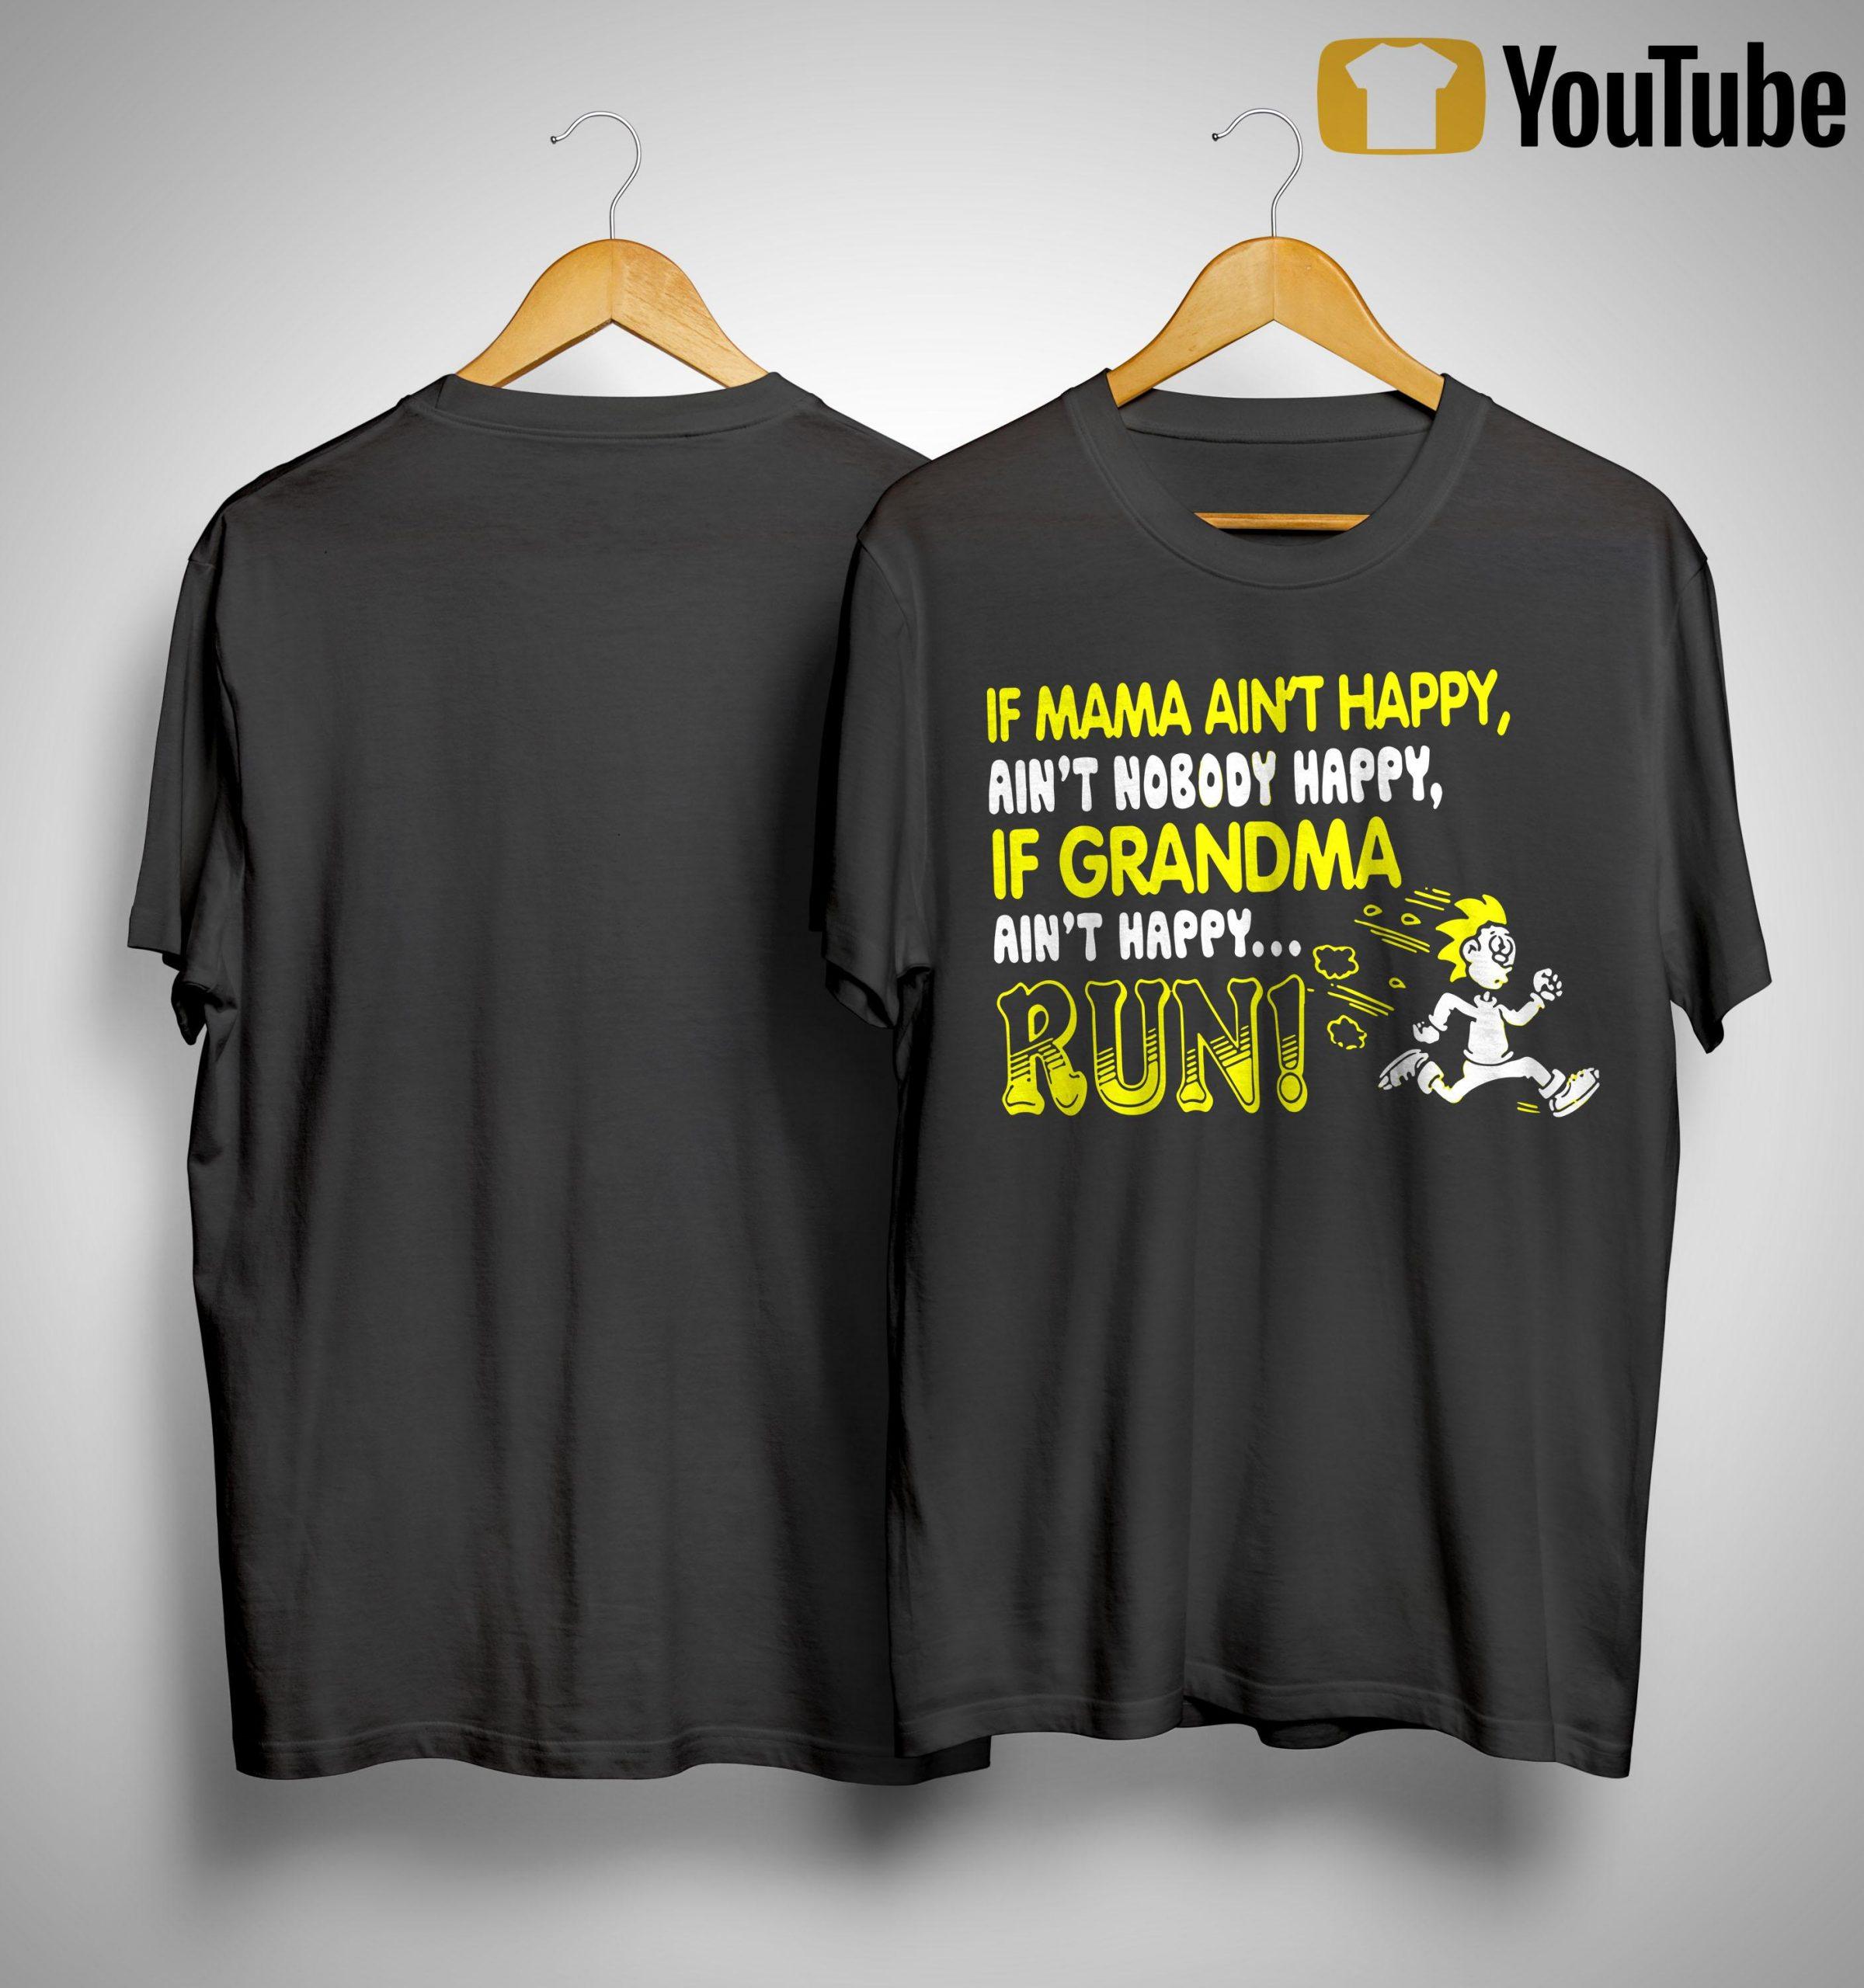 If Mama Aint Happy Ain't Nobody Happy If Grandma Aint Happy Run Shirt